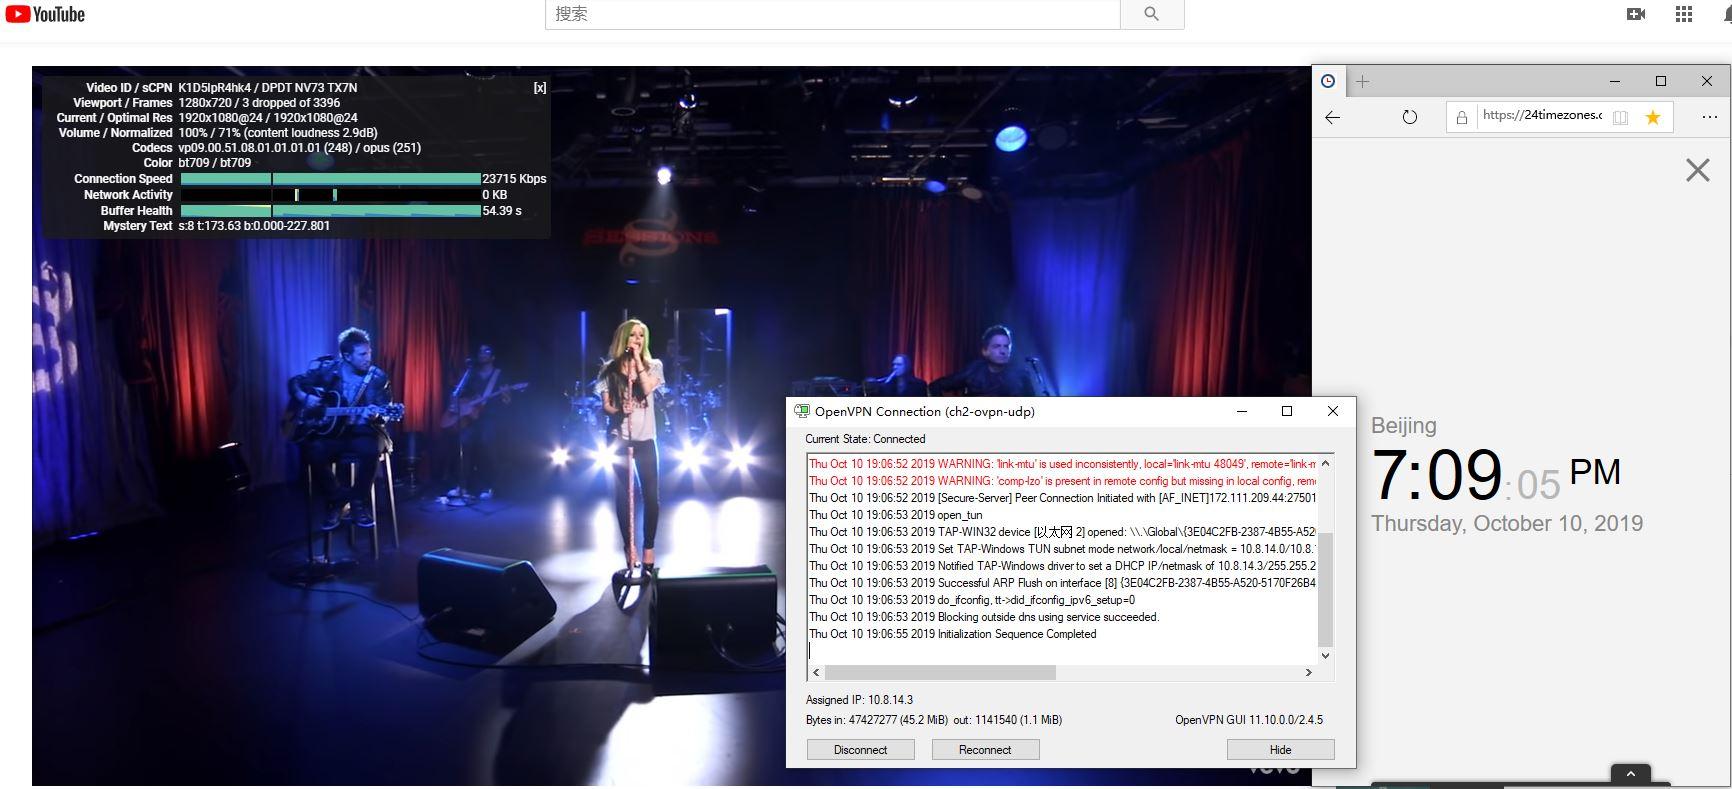 Windows IvacyVPN OPEN VPN GUI CH2 中国VPN翻墙 科学上网 Youtube测速-20191010